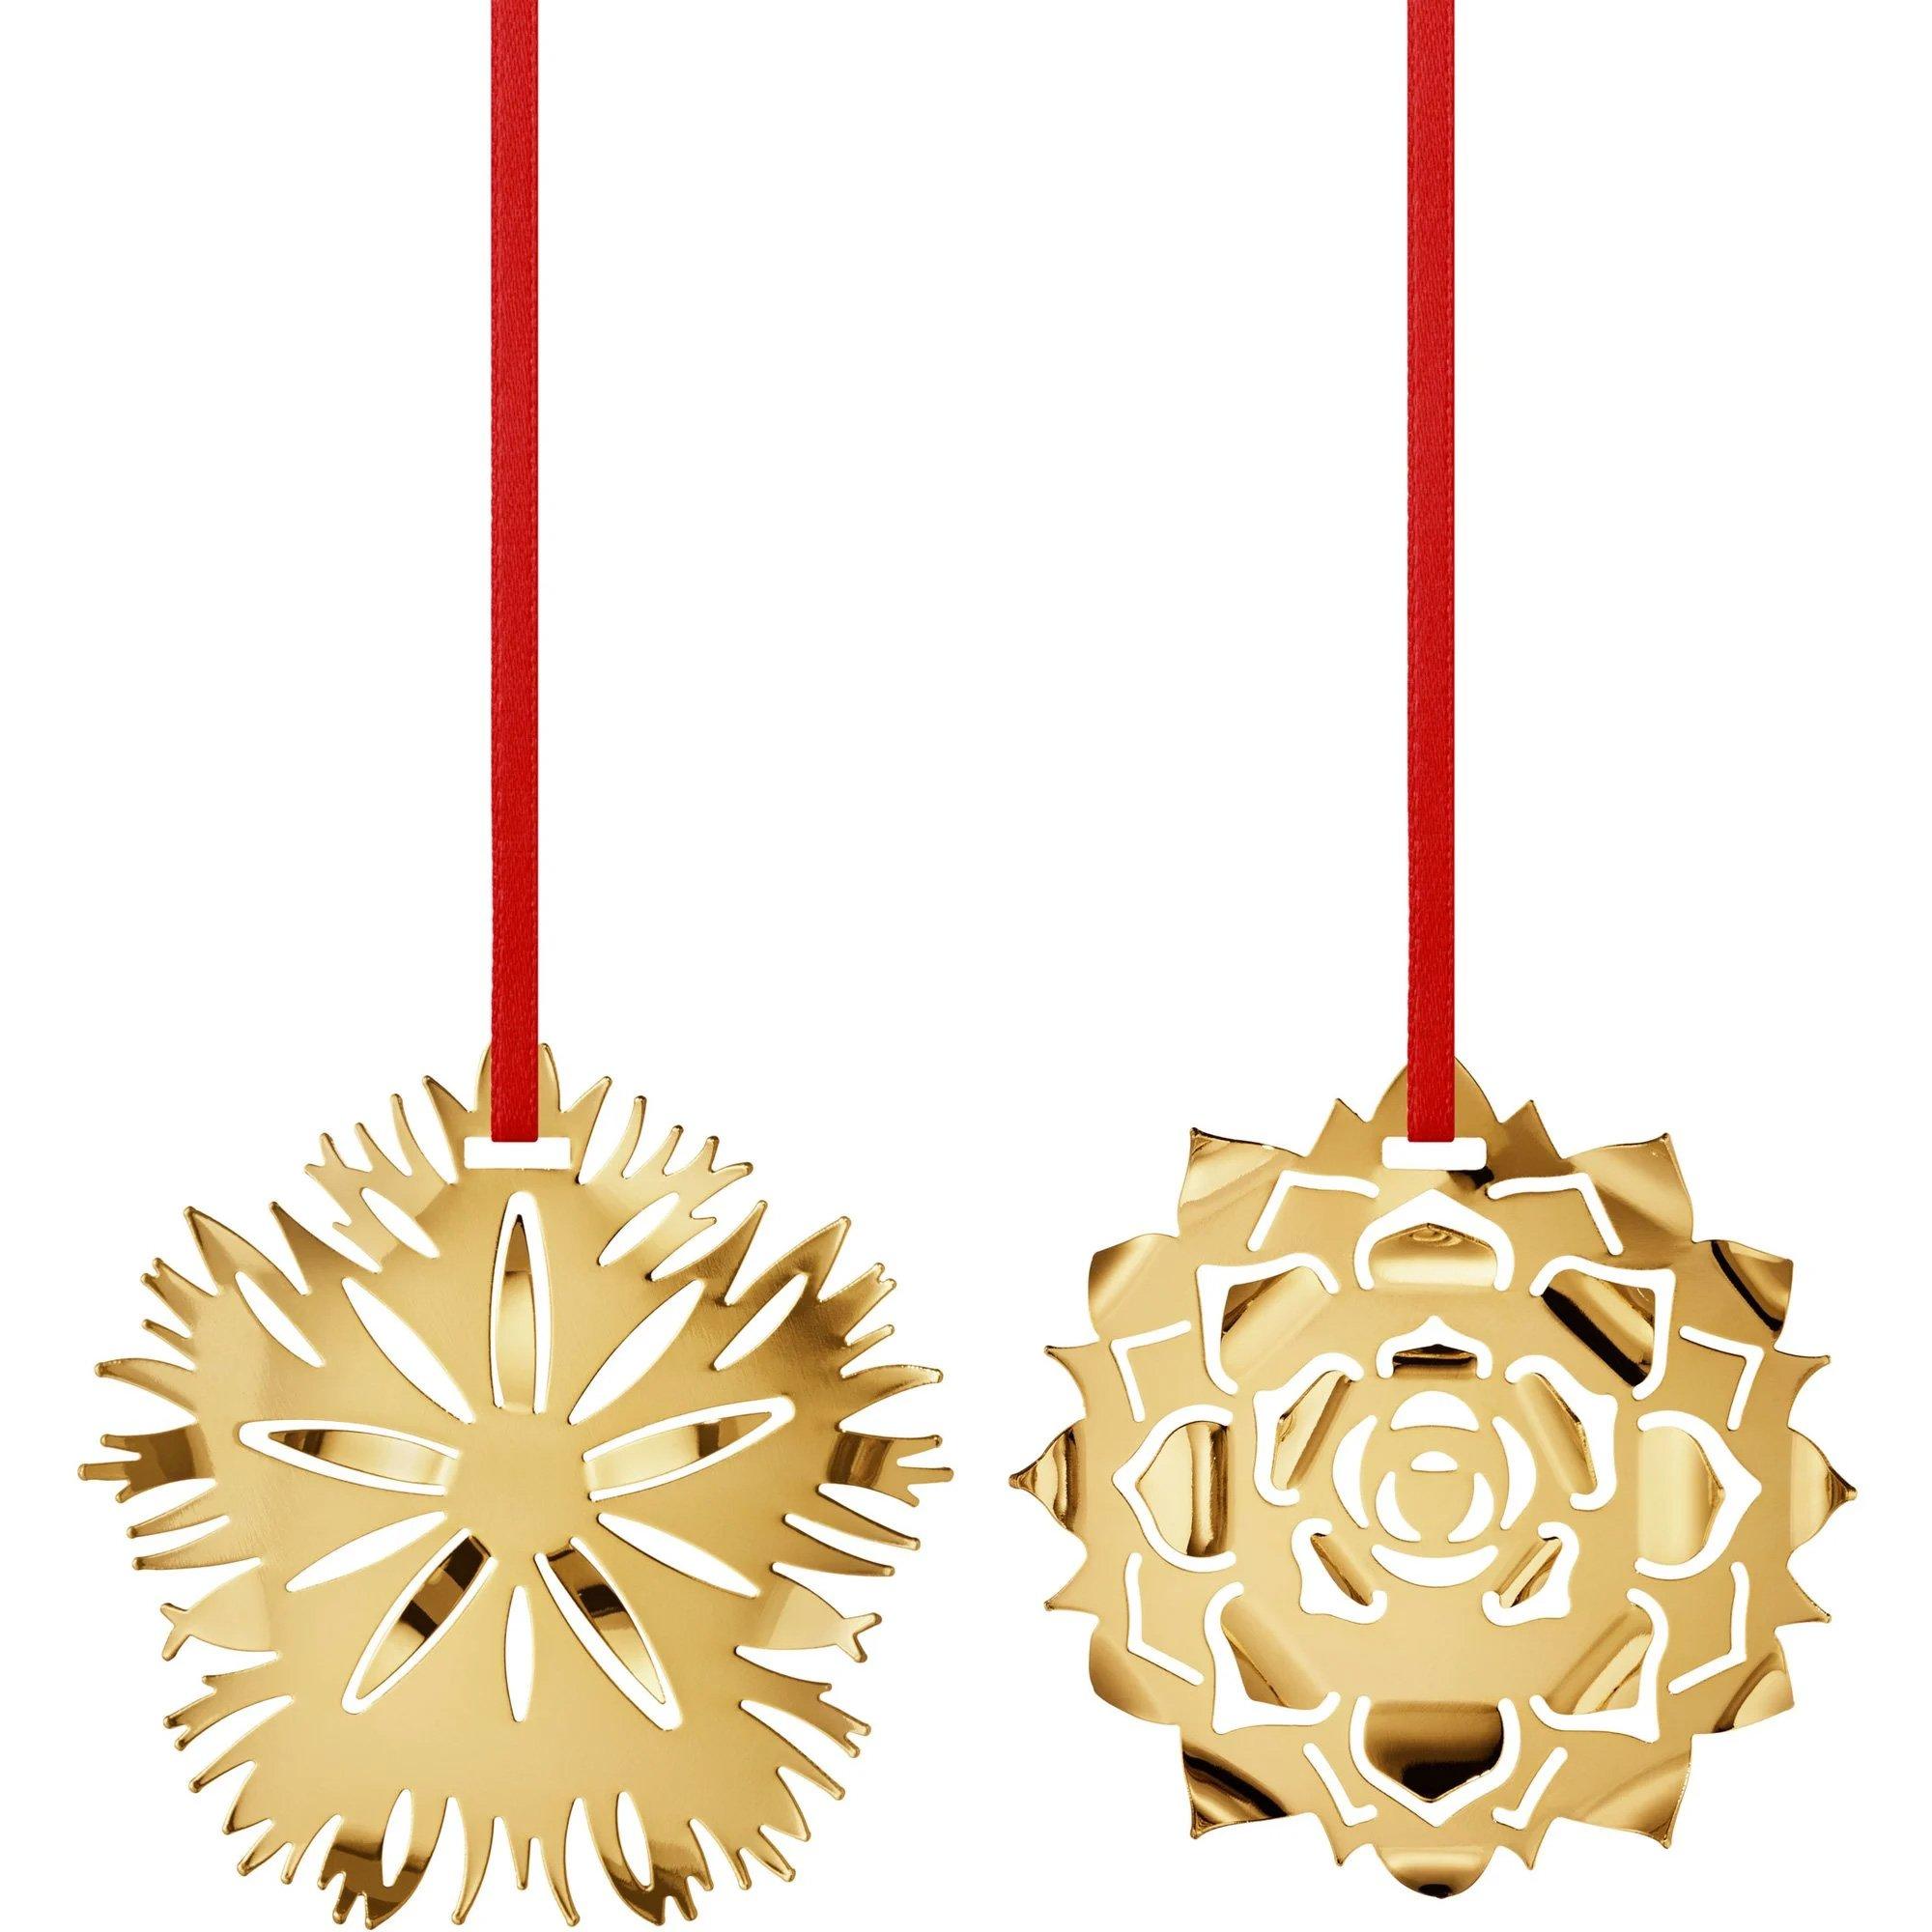 Georg Jensen 2020 Ornament Ice & Ice Rosette guld